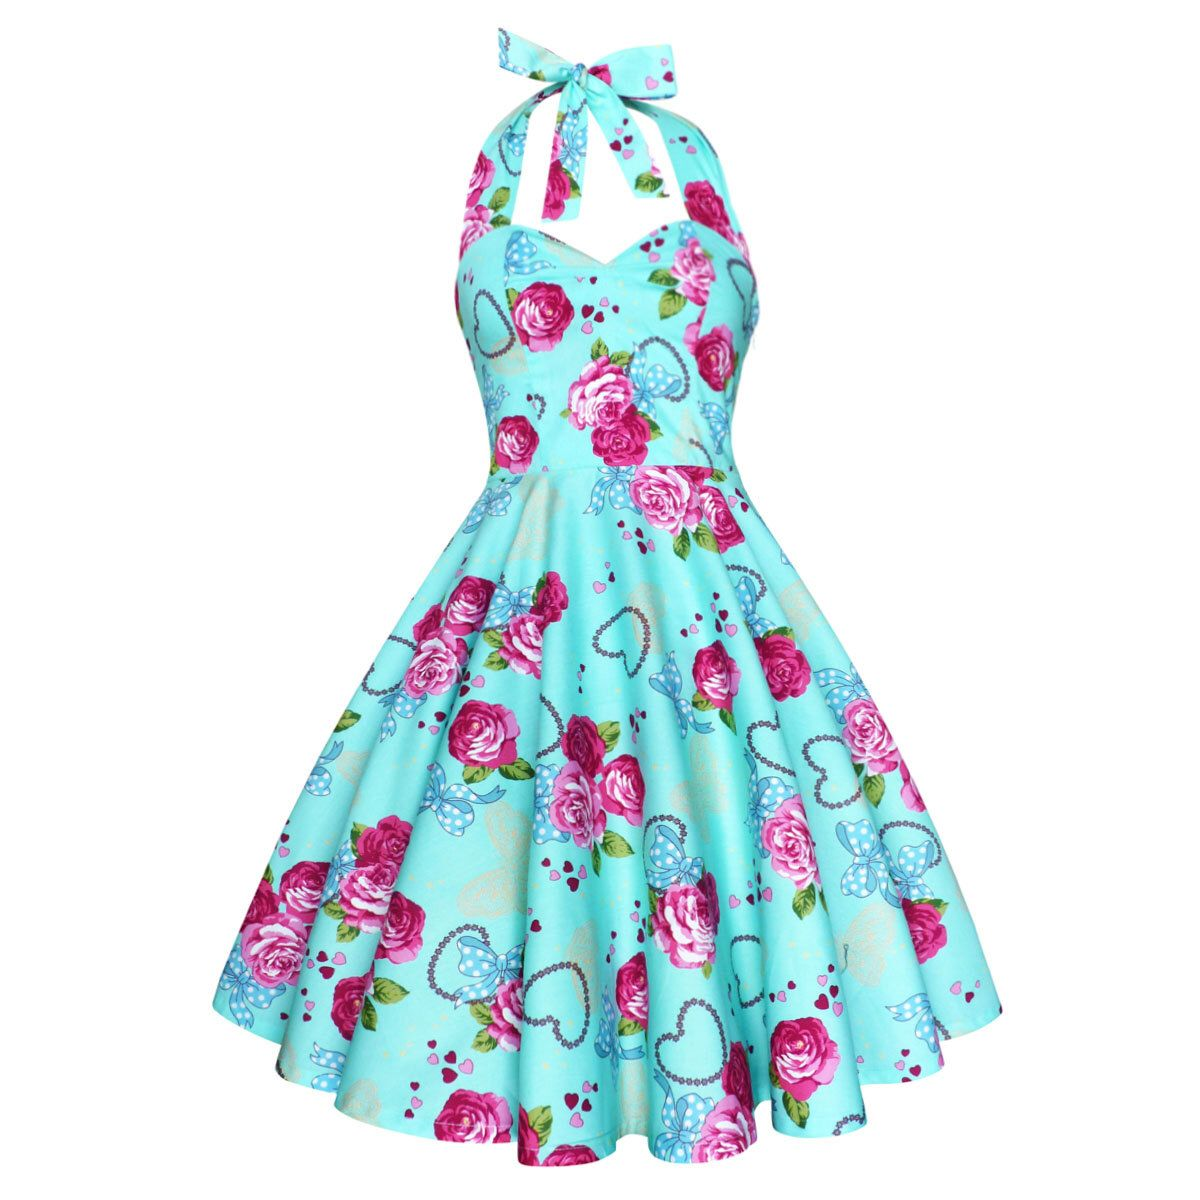 Pinup Dress Pastel Blue Rose Vintage 50s Rockabilly Clothing Pin ...